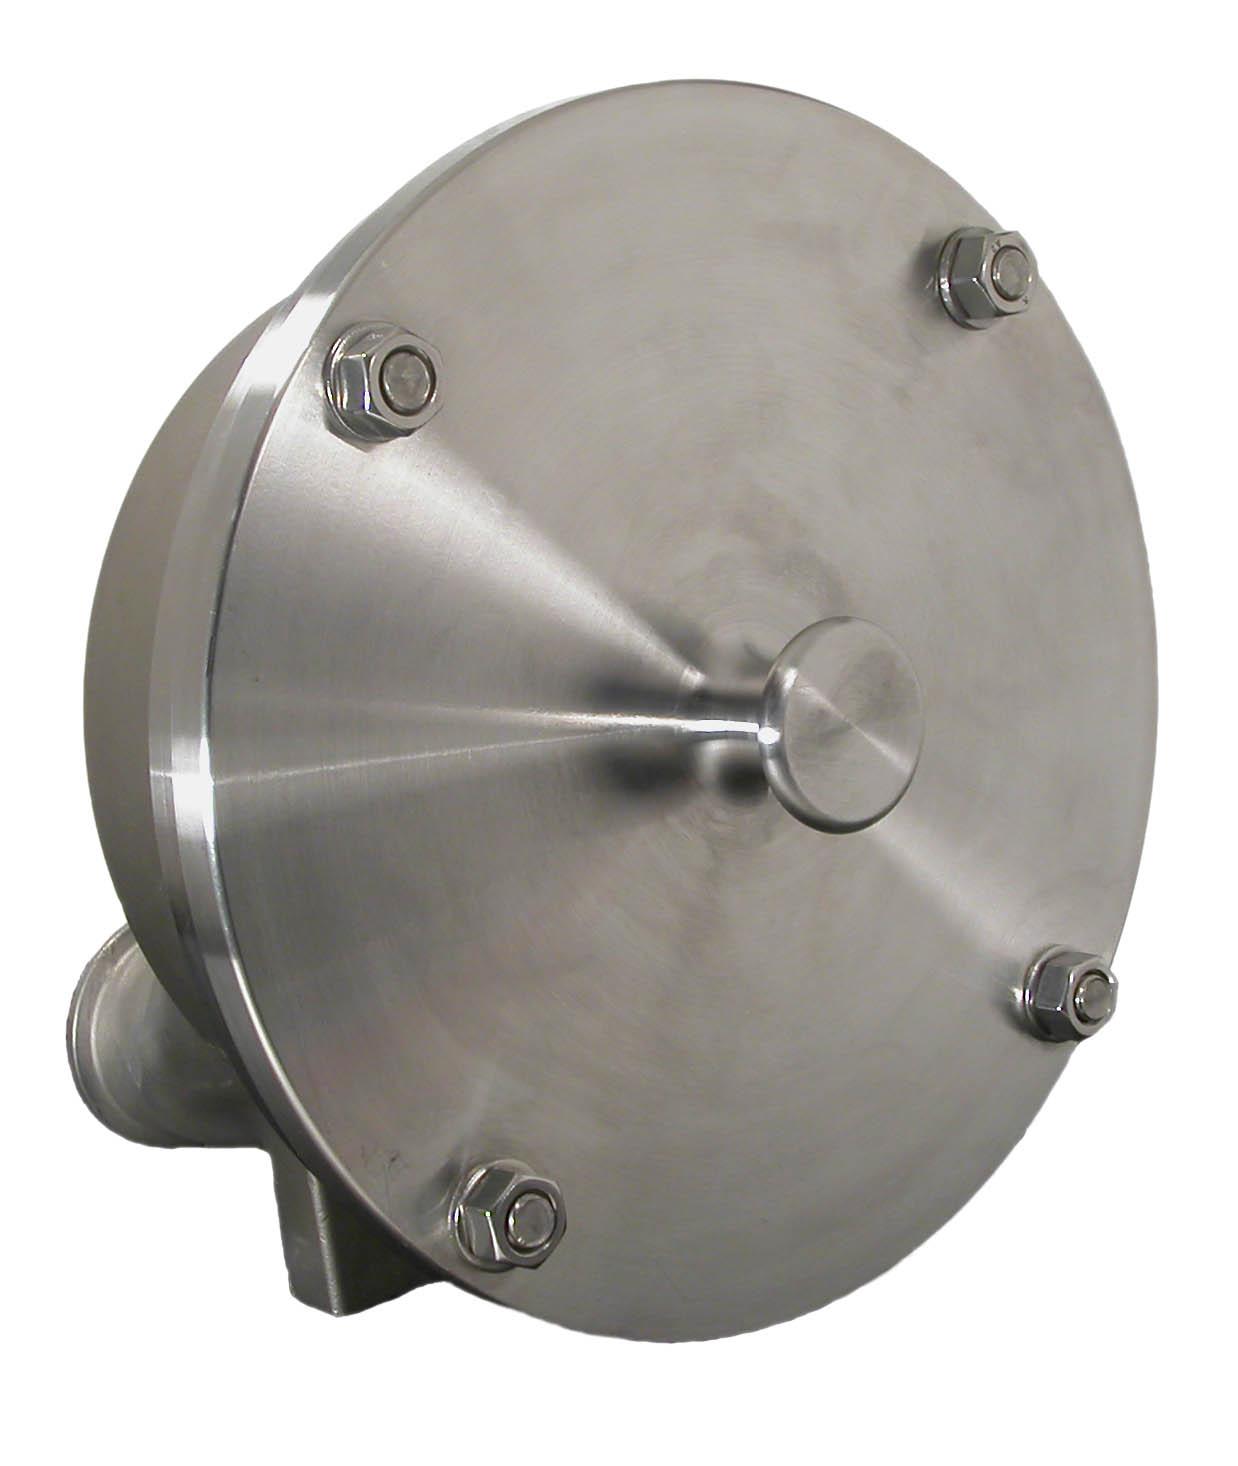 RZ-2AUCaudalímetro de Desplazamiento Positivo de Remplazo - Array - Img 1 - Anderson-Negele